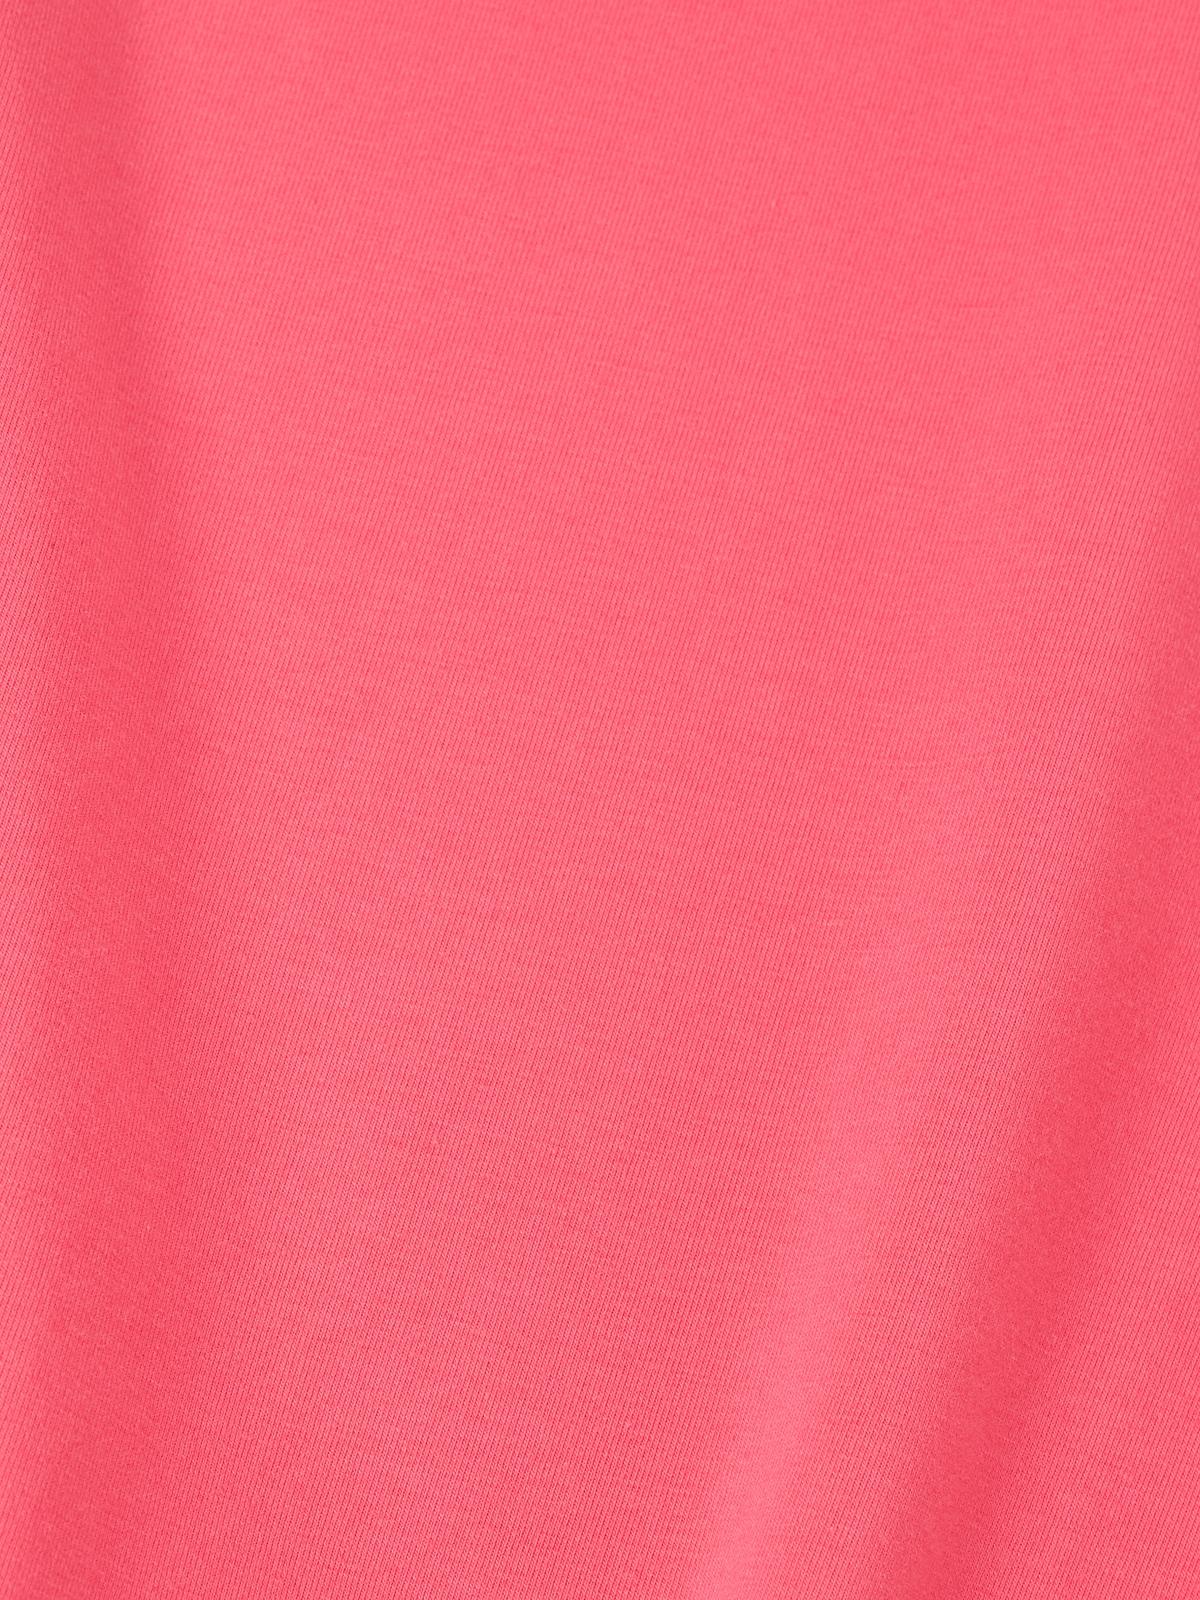 Crew Neck Basic Top Pink